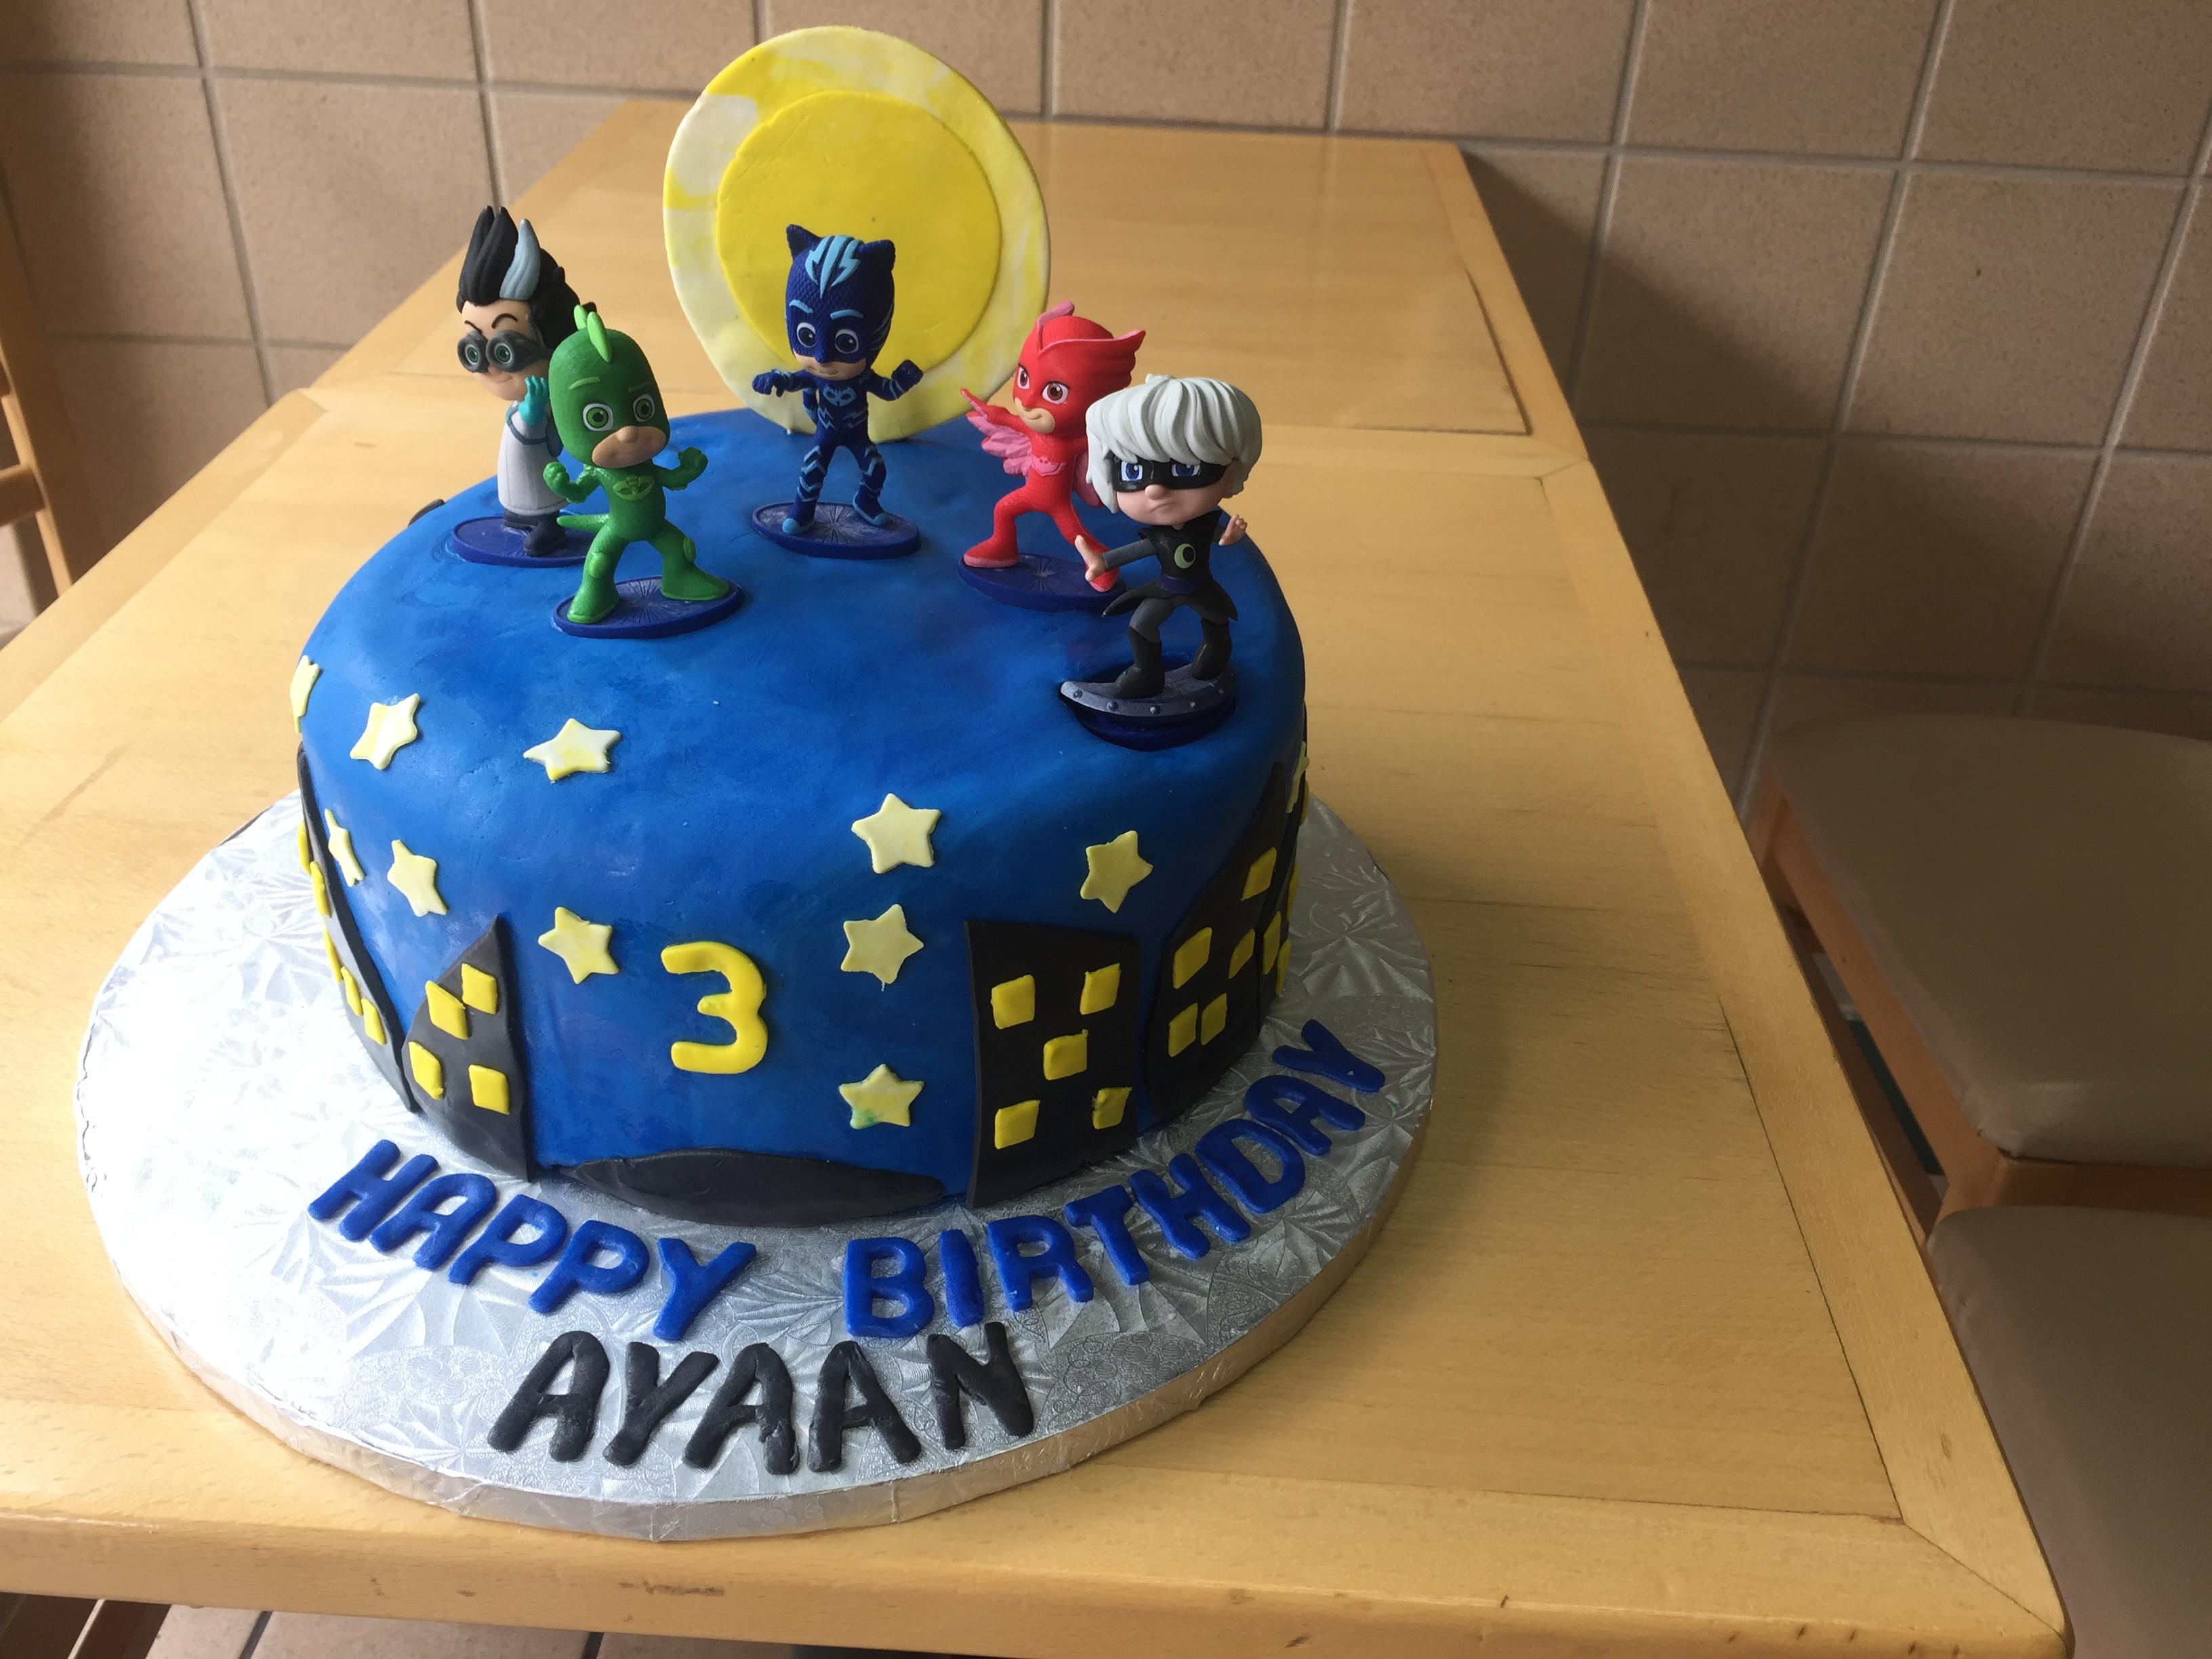 Pj Masks Birthday Cake Wild Berries Bakery And Cafe